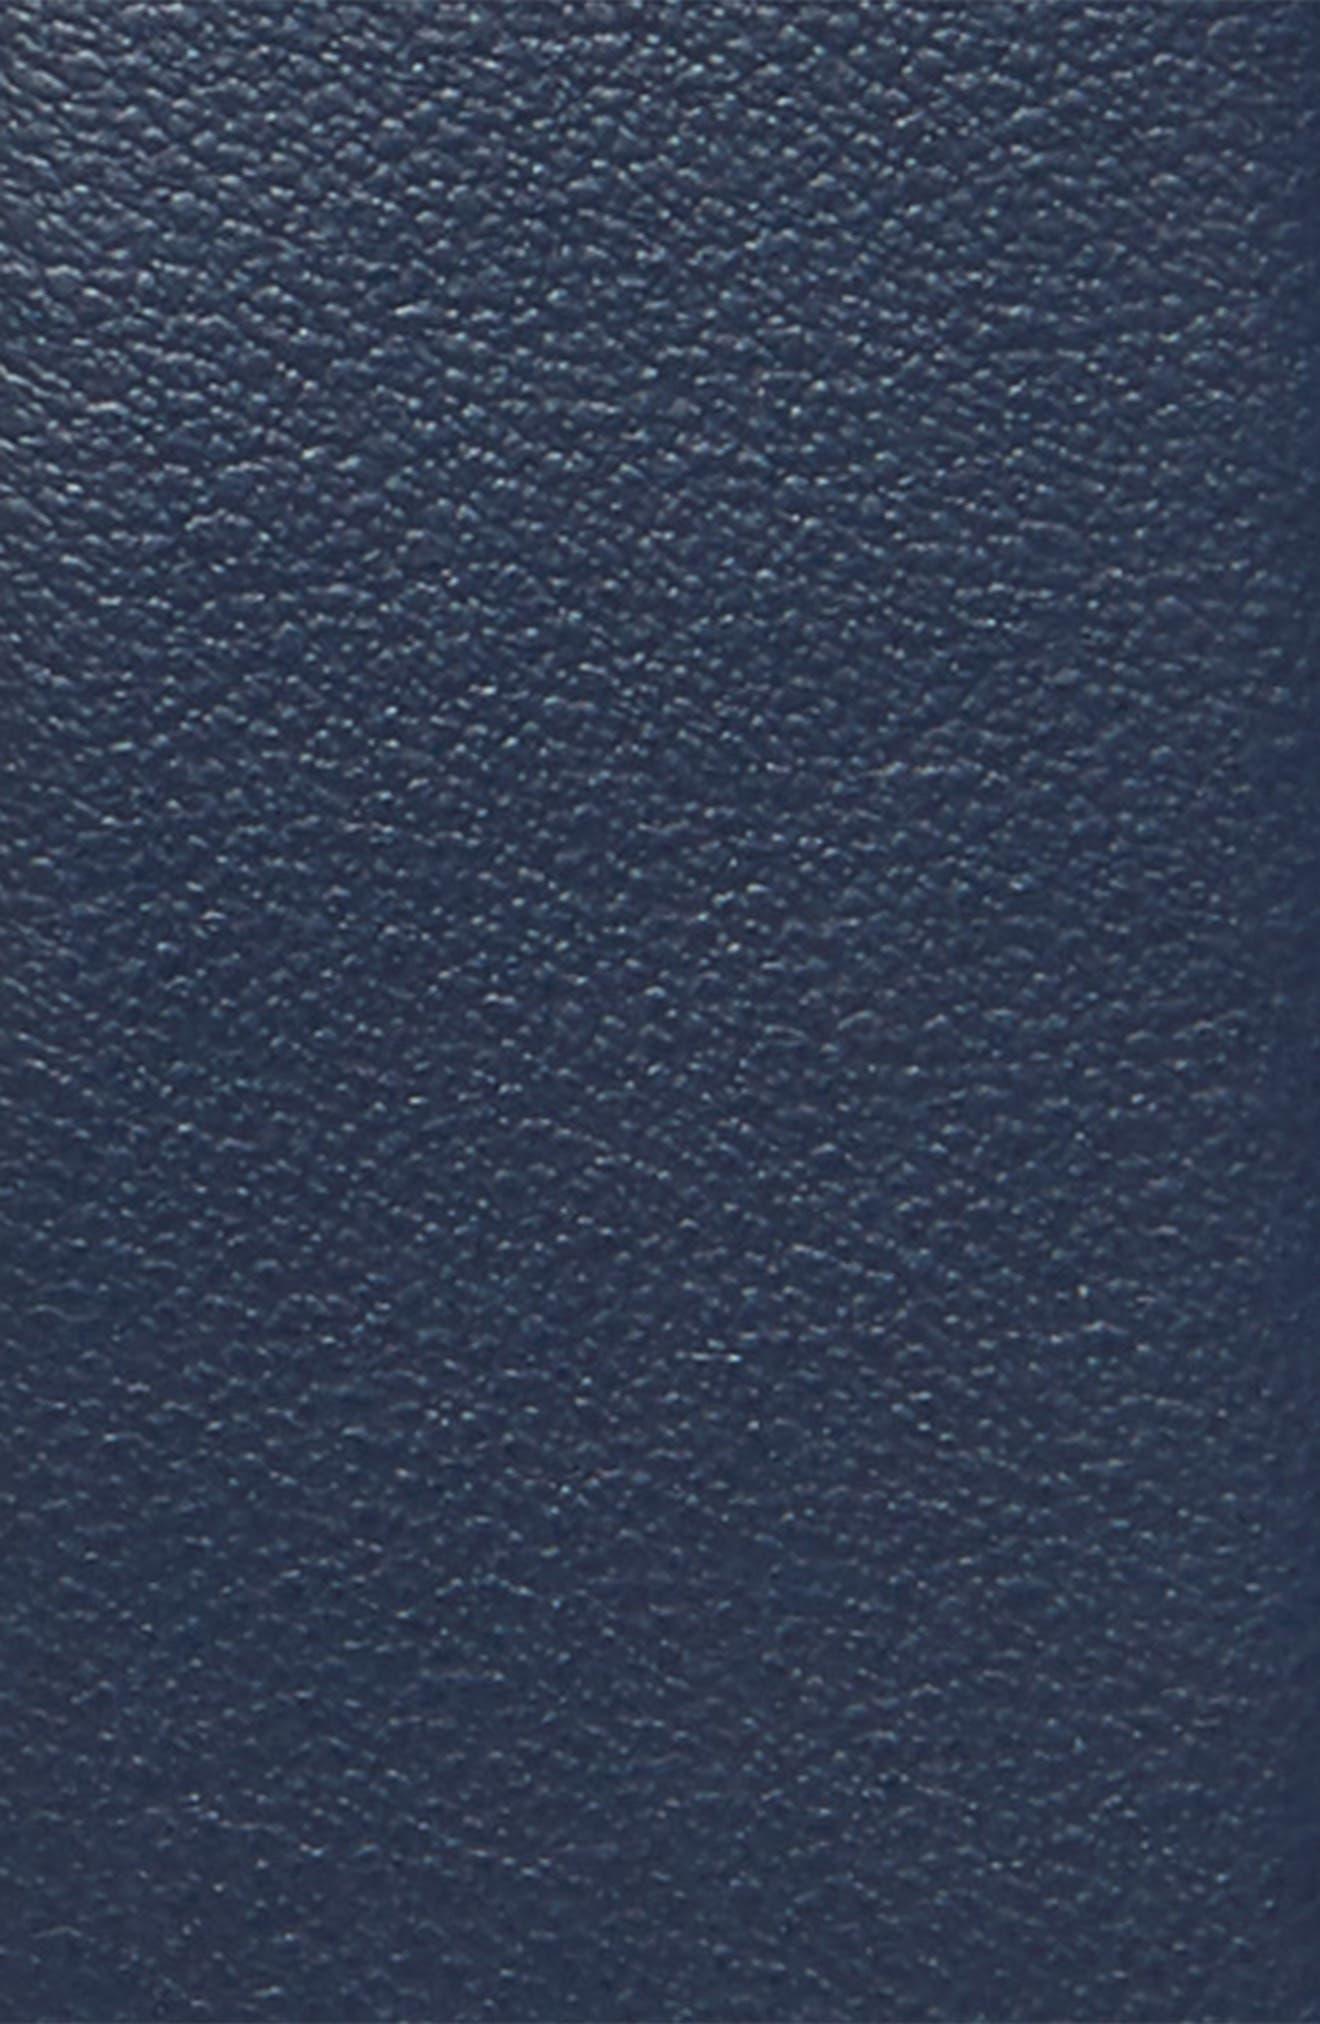 Etched Double Gancio Reversible Leather Belt,                             Alternate thumbnail 3, color,                             Blue Marine/ Black